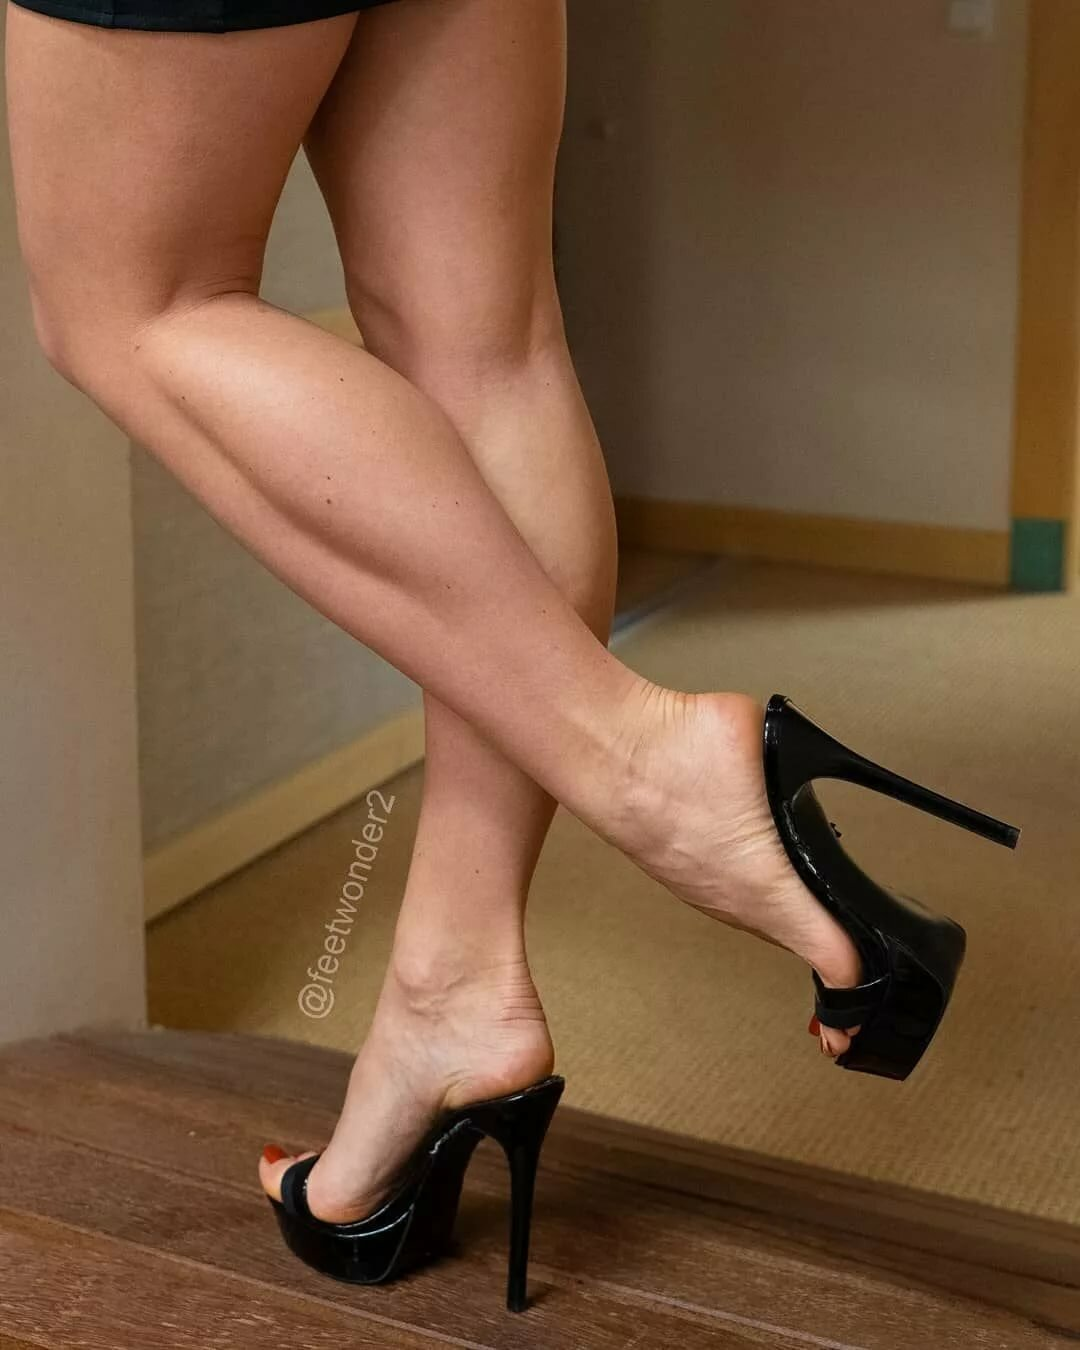 Sensuality sensual sexy woman girl model legs feet barefoot sitting